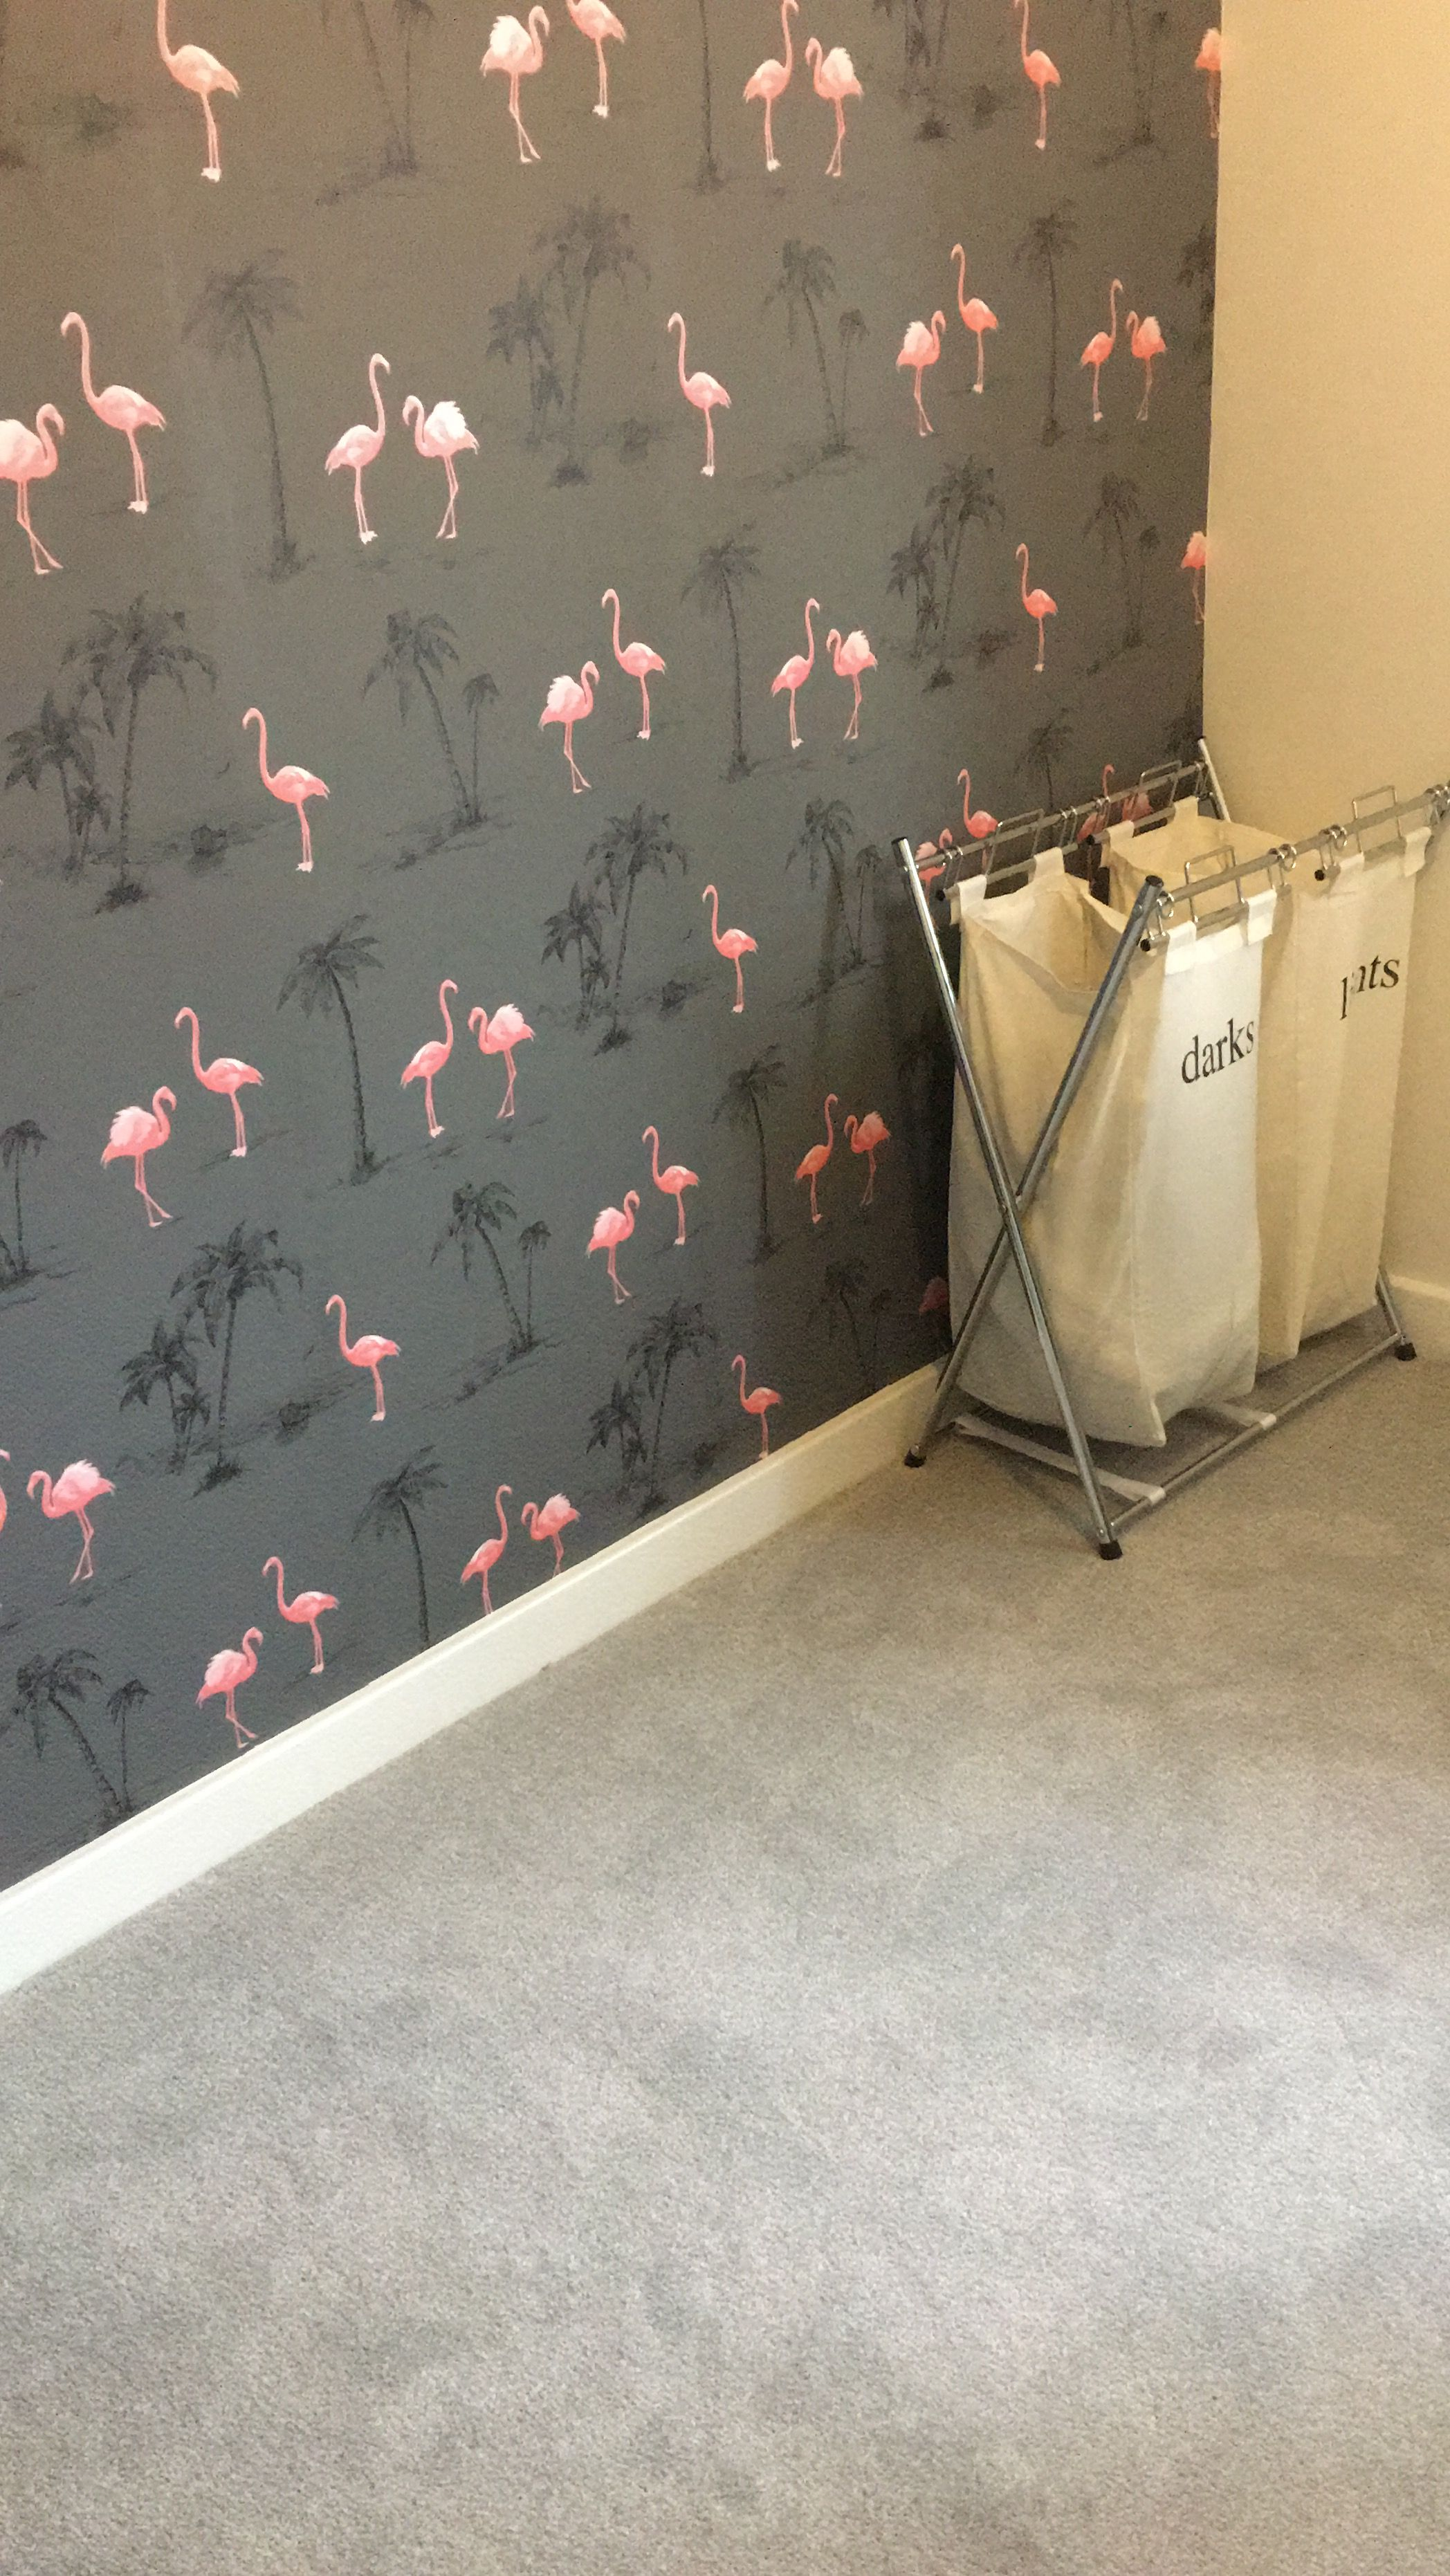 B Q Flamingo Wallpaper Flamingo Wallpaper Flamingo Wallpaper Bedroom Wallpaper Bedroom